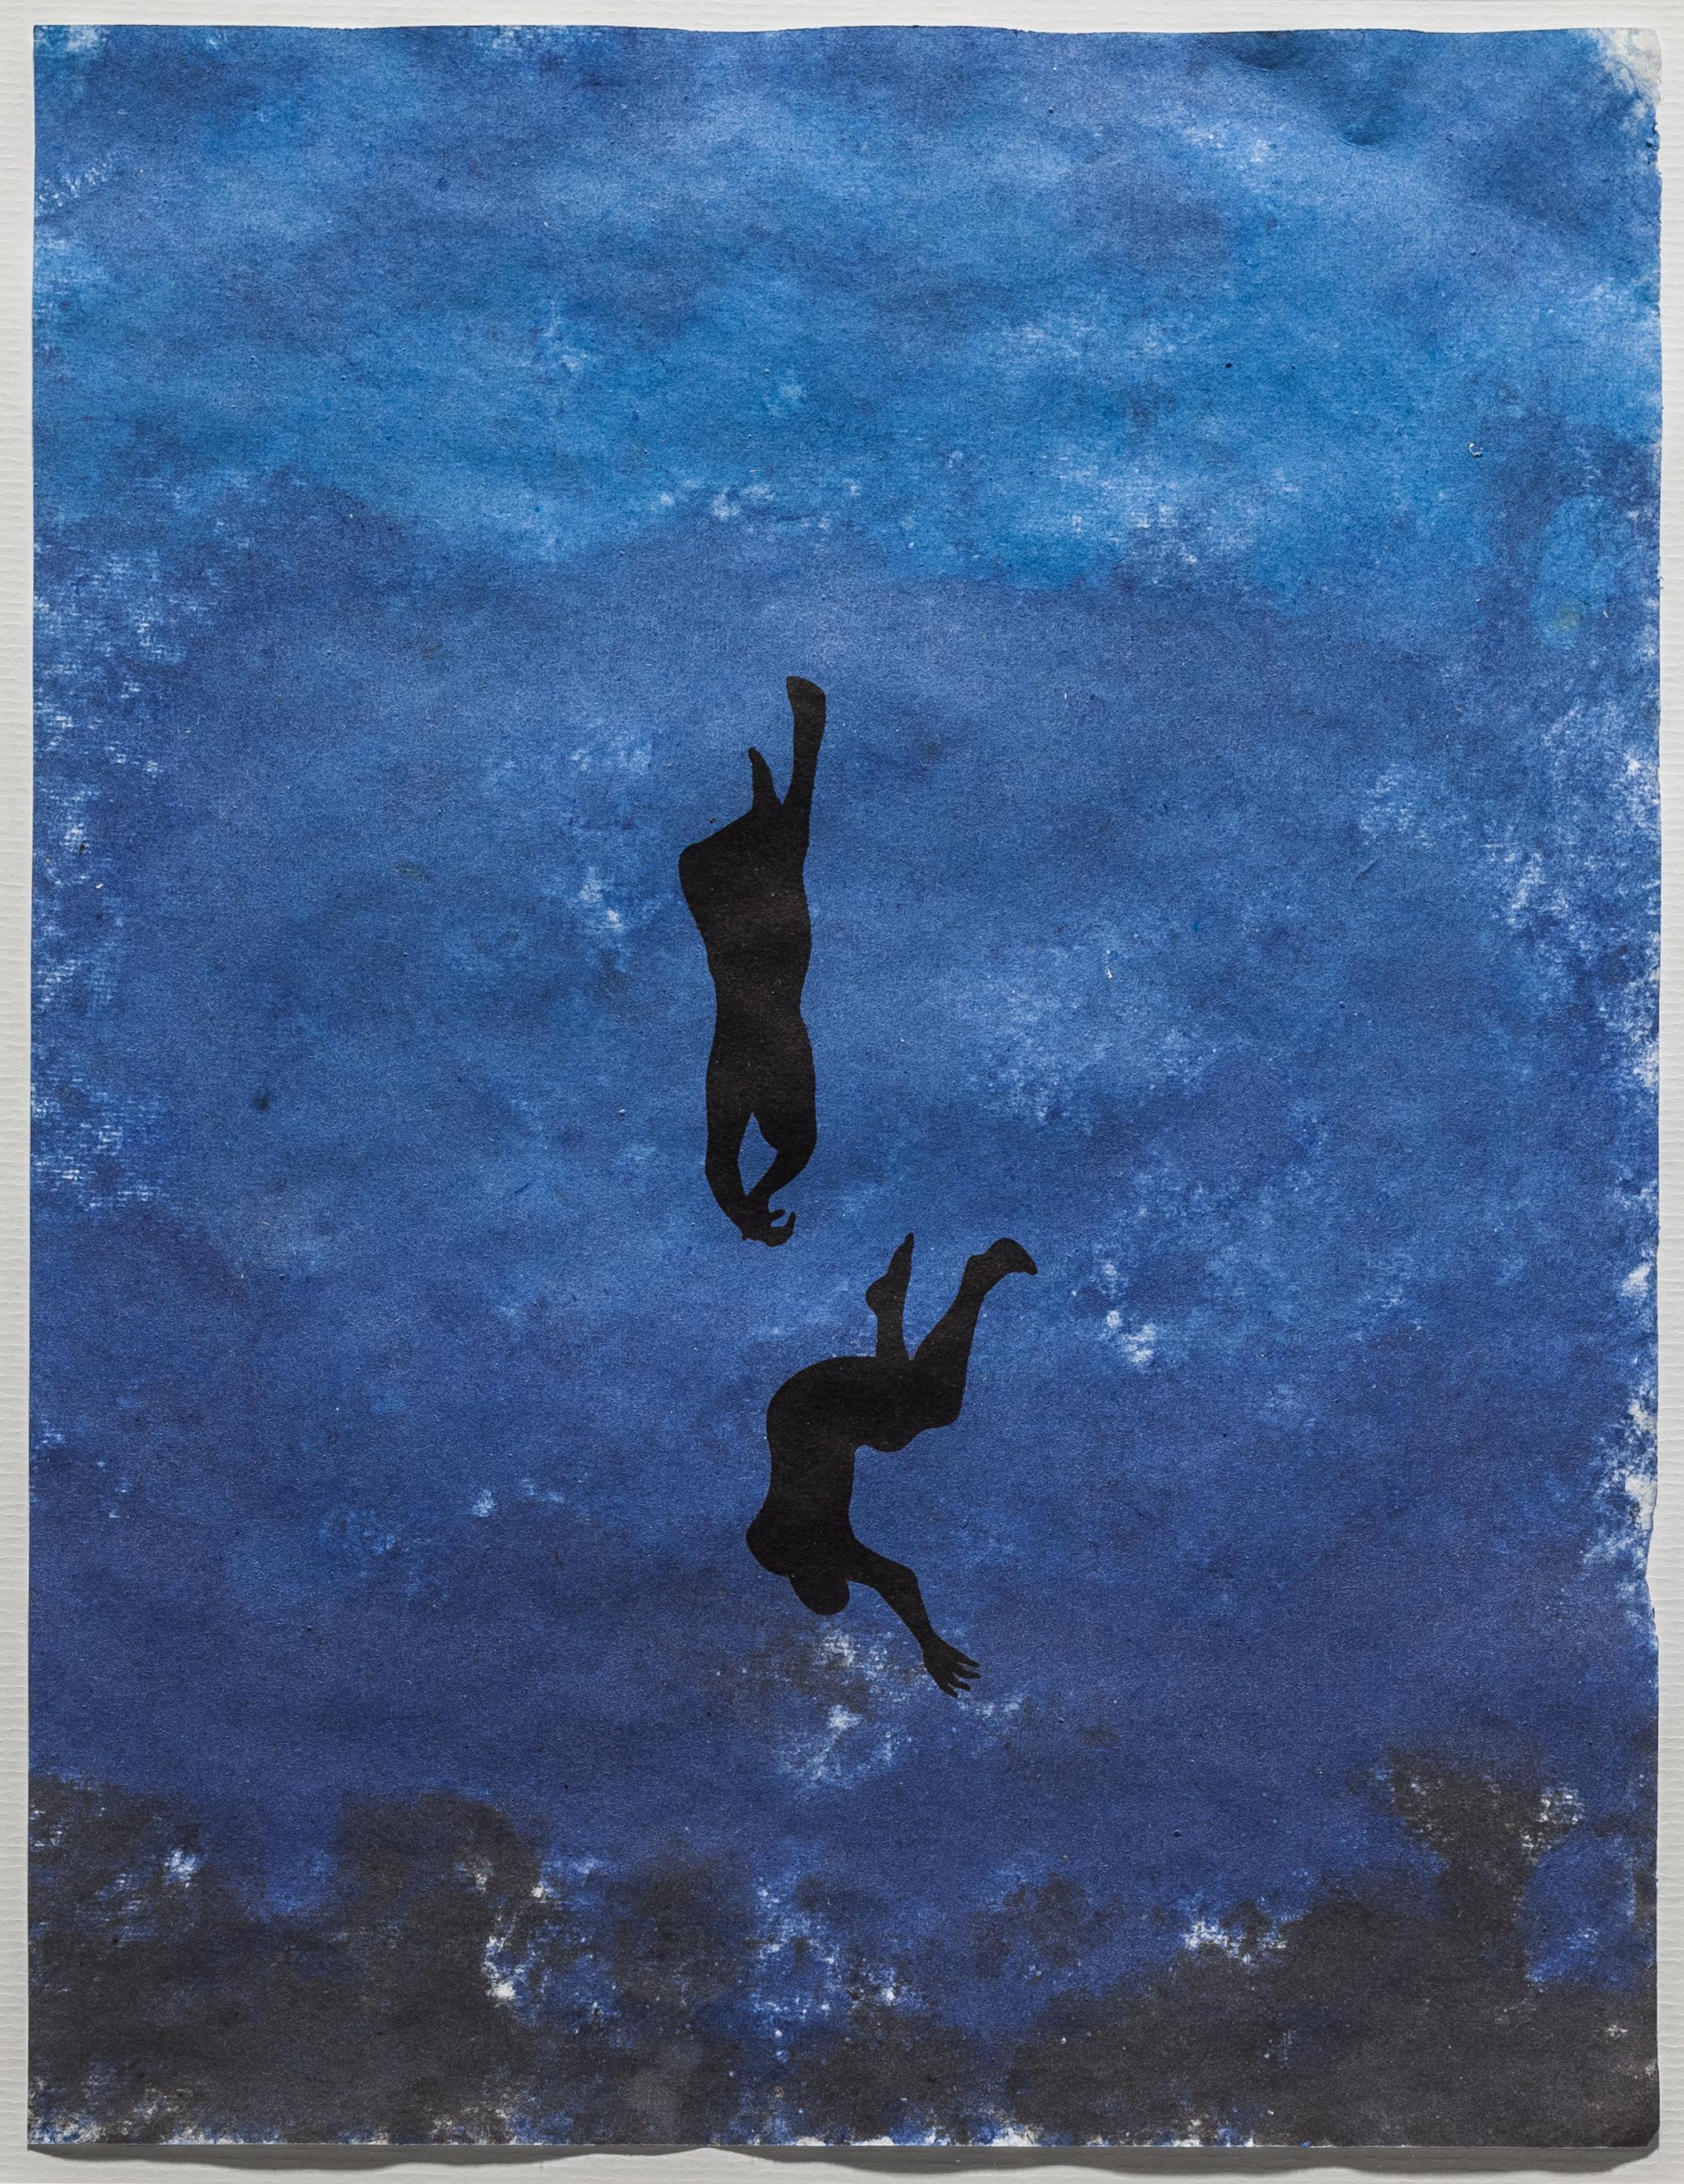 Parastou Forouhar, Burdened Paper, 2015